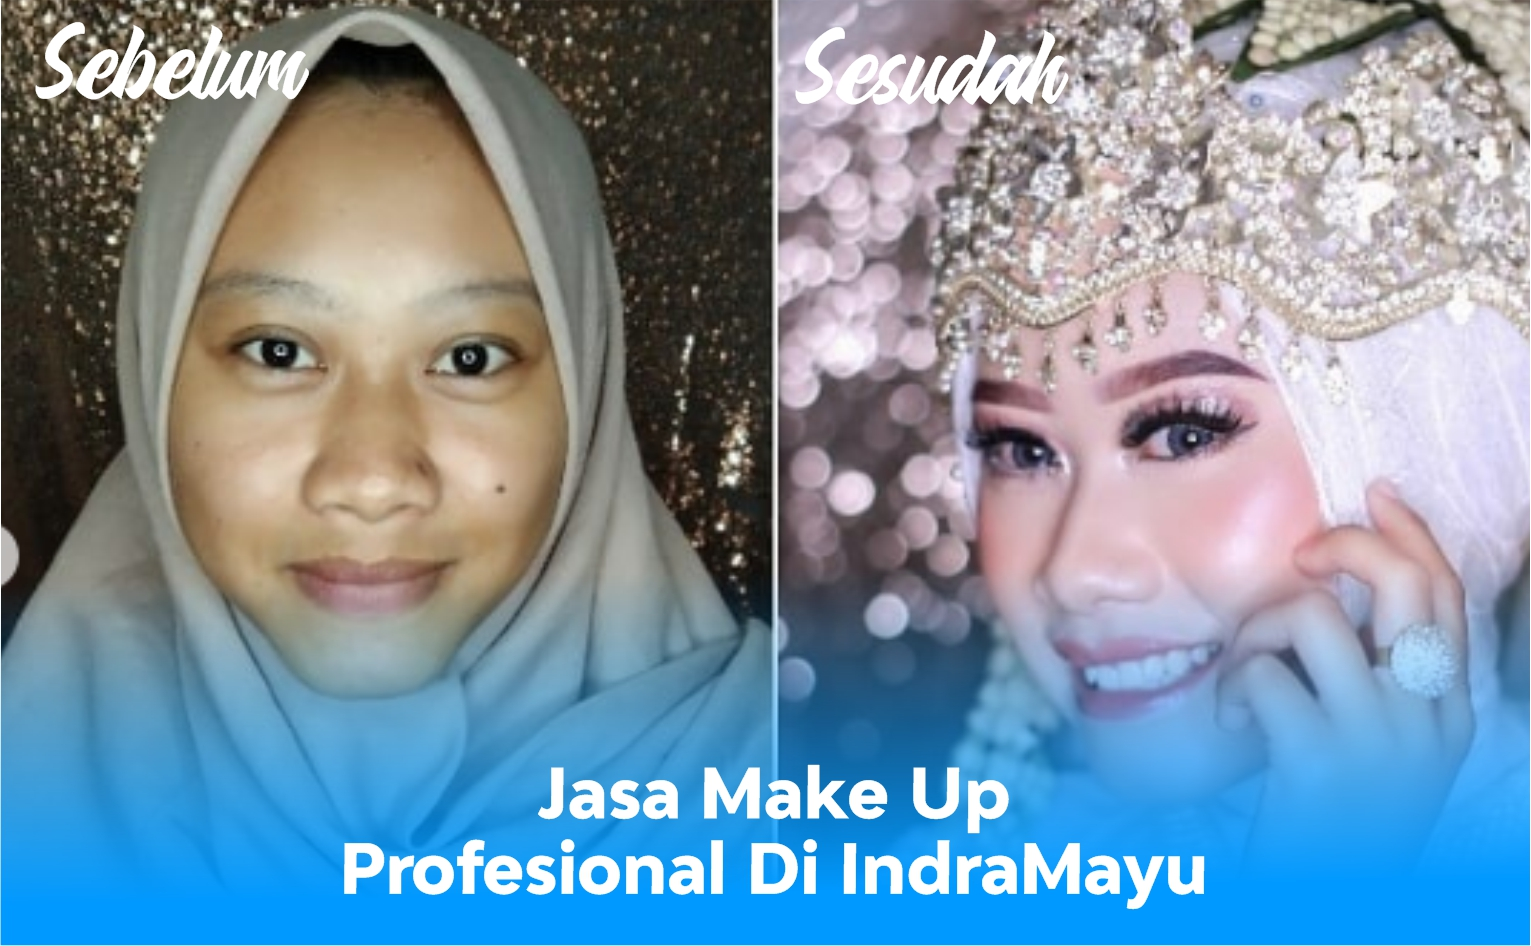 jasa makeup dan rias pengantin di indramayu